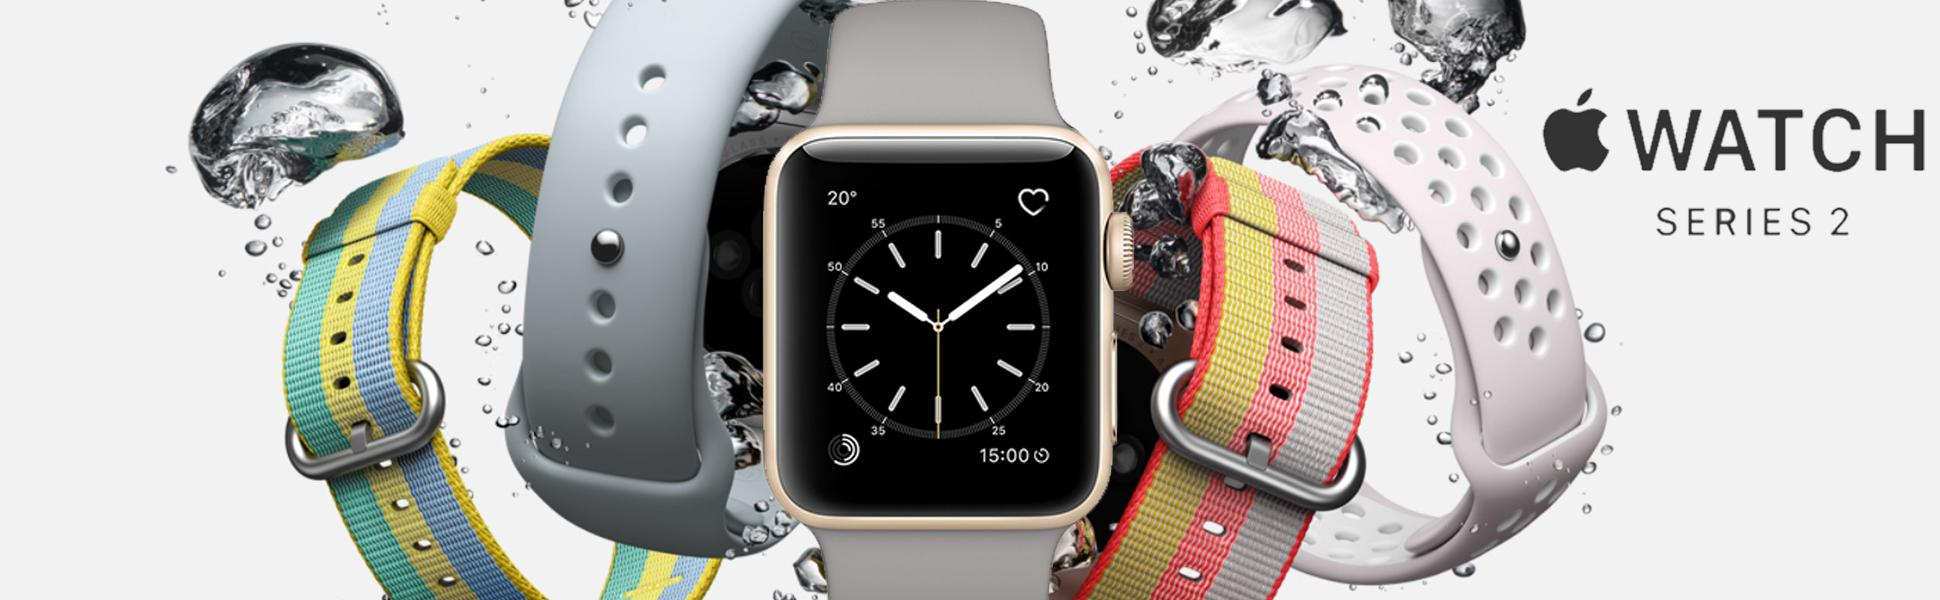 Apple Watch Series 2 38mm Smartwatch Gold Aluminum Case 1 Rose Pink Sport Band Concrete Sports 42mm